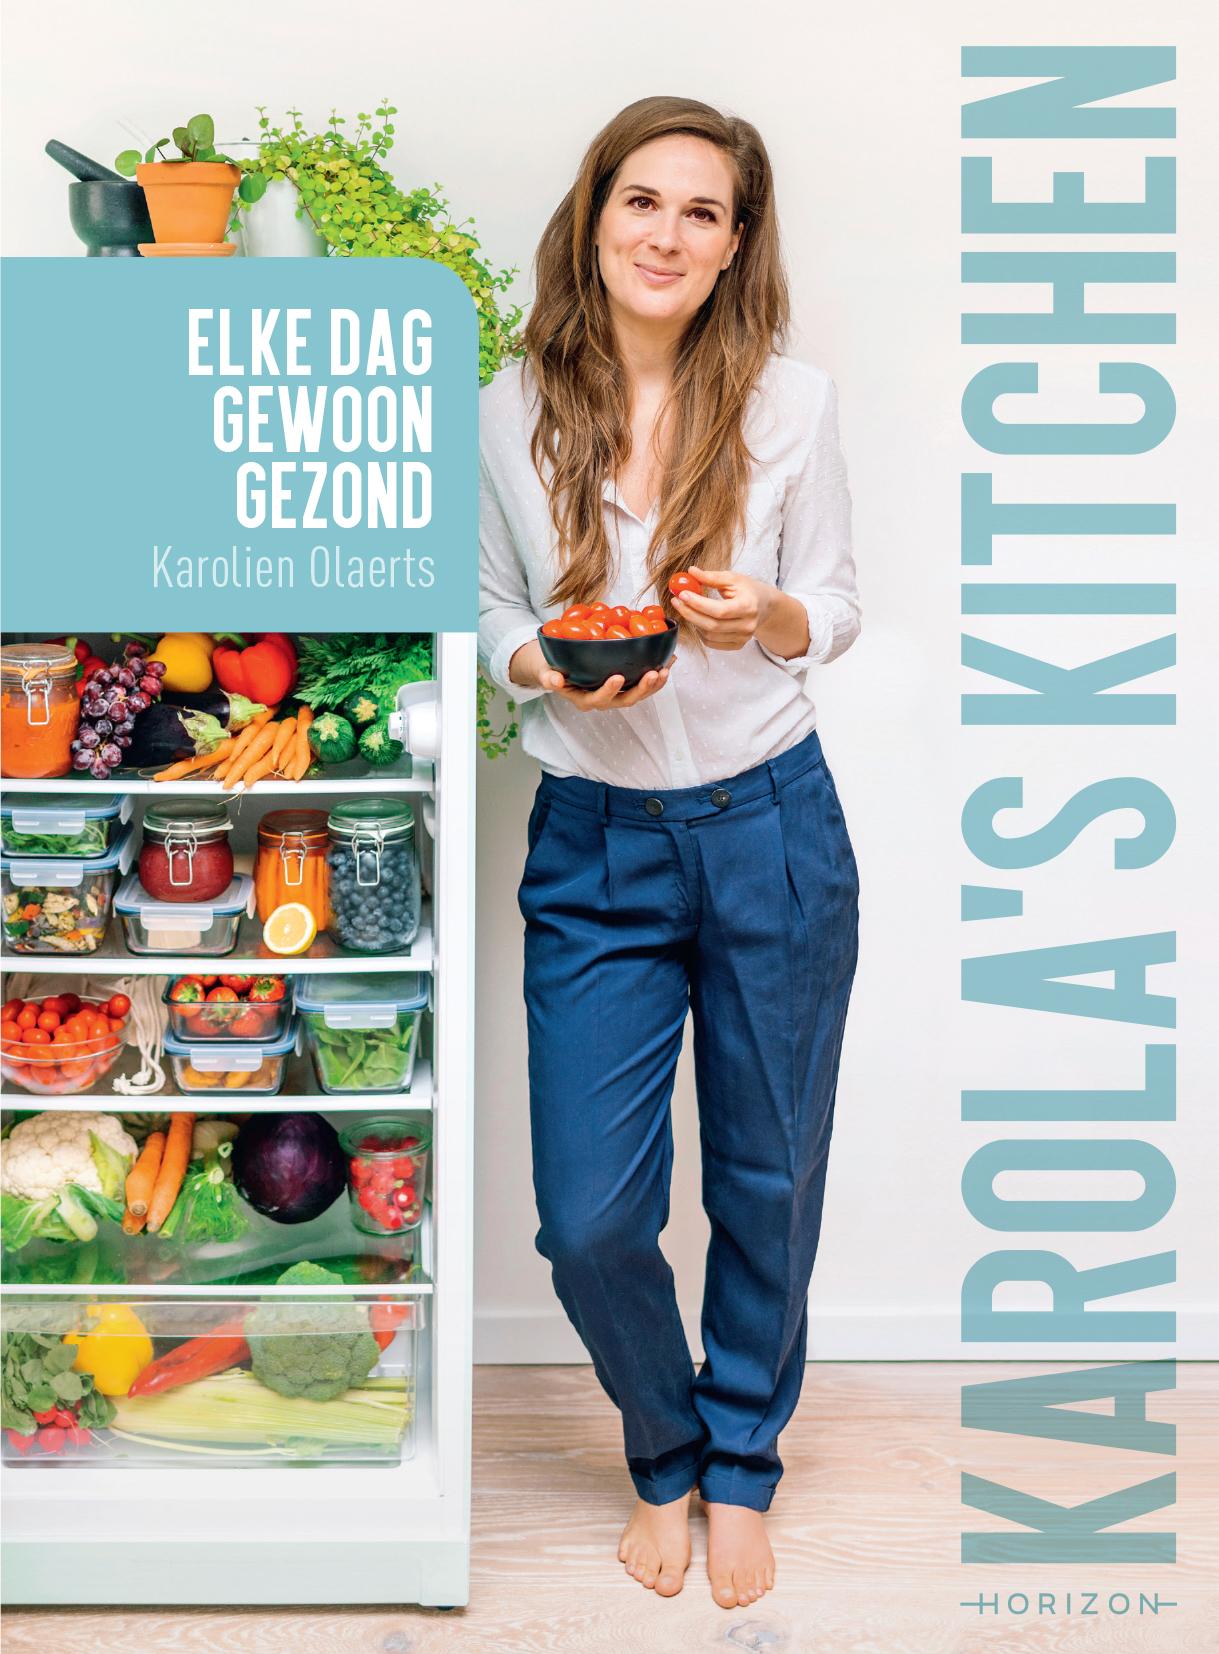 Boek Karola's Kitchen - Elke dag gewoon gezond - Karolien Olaerts